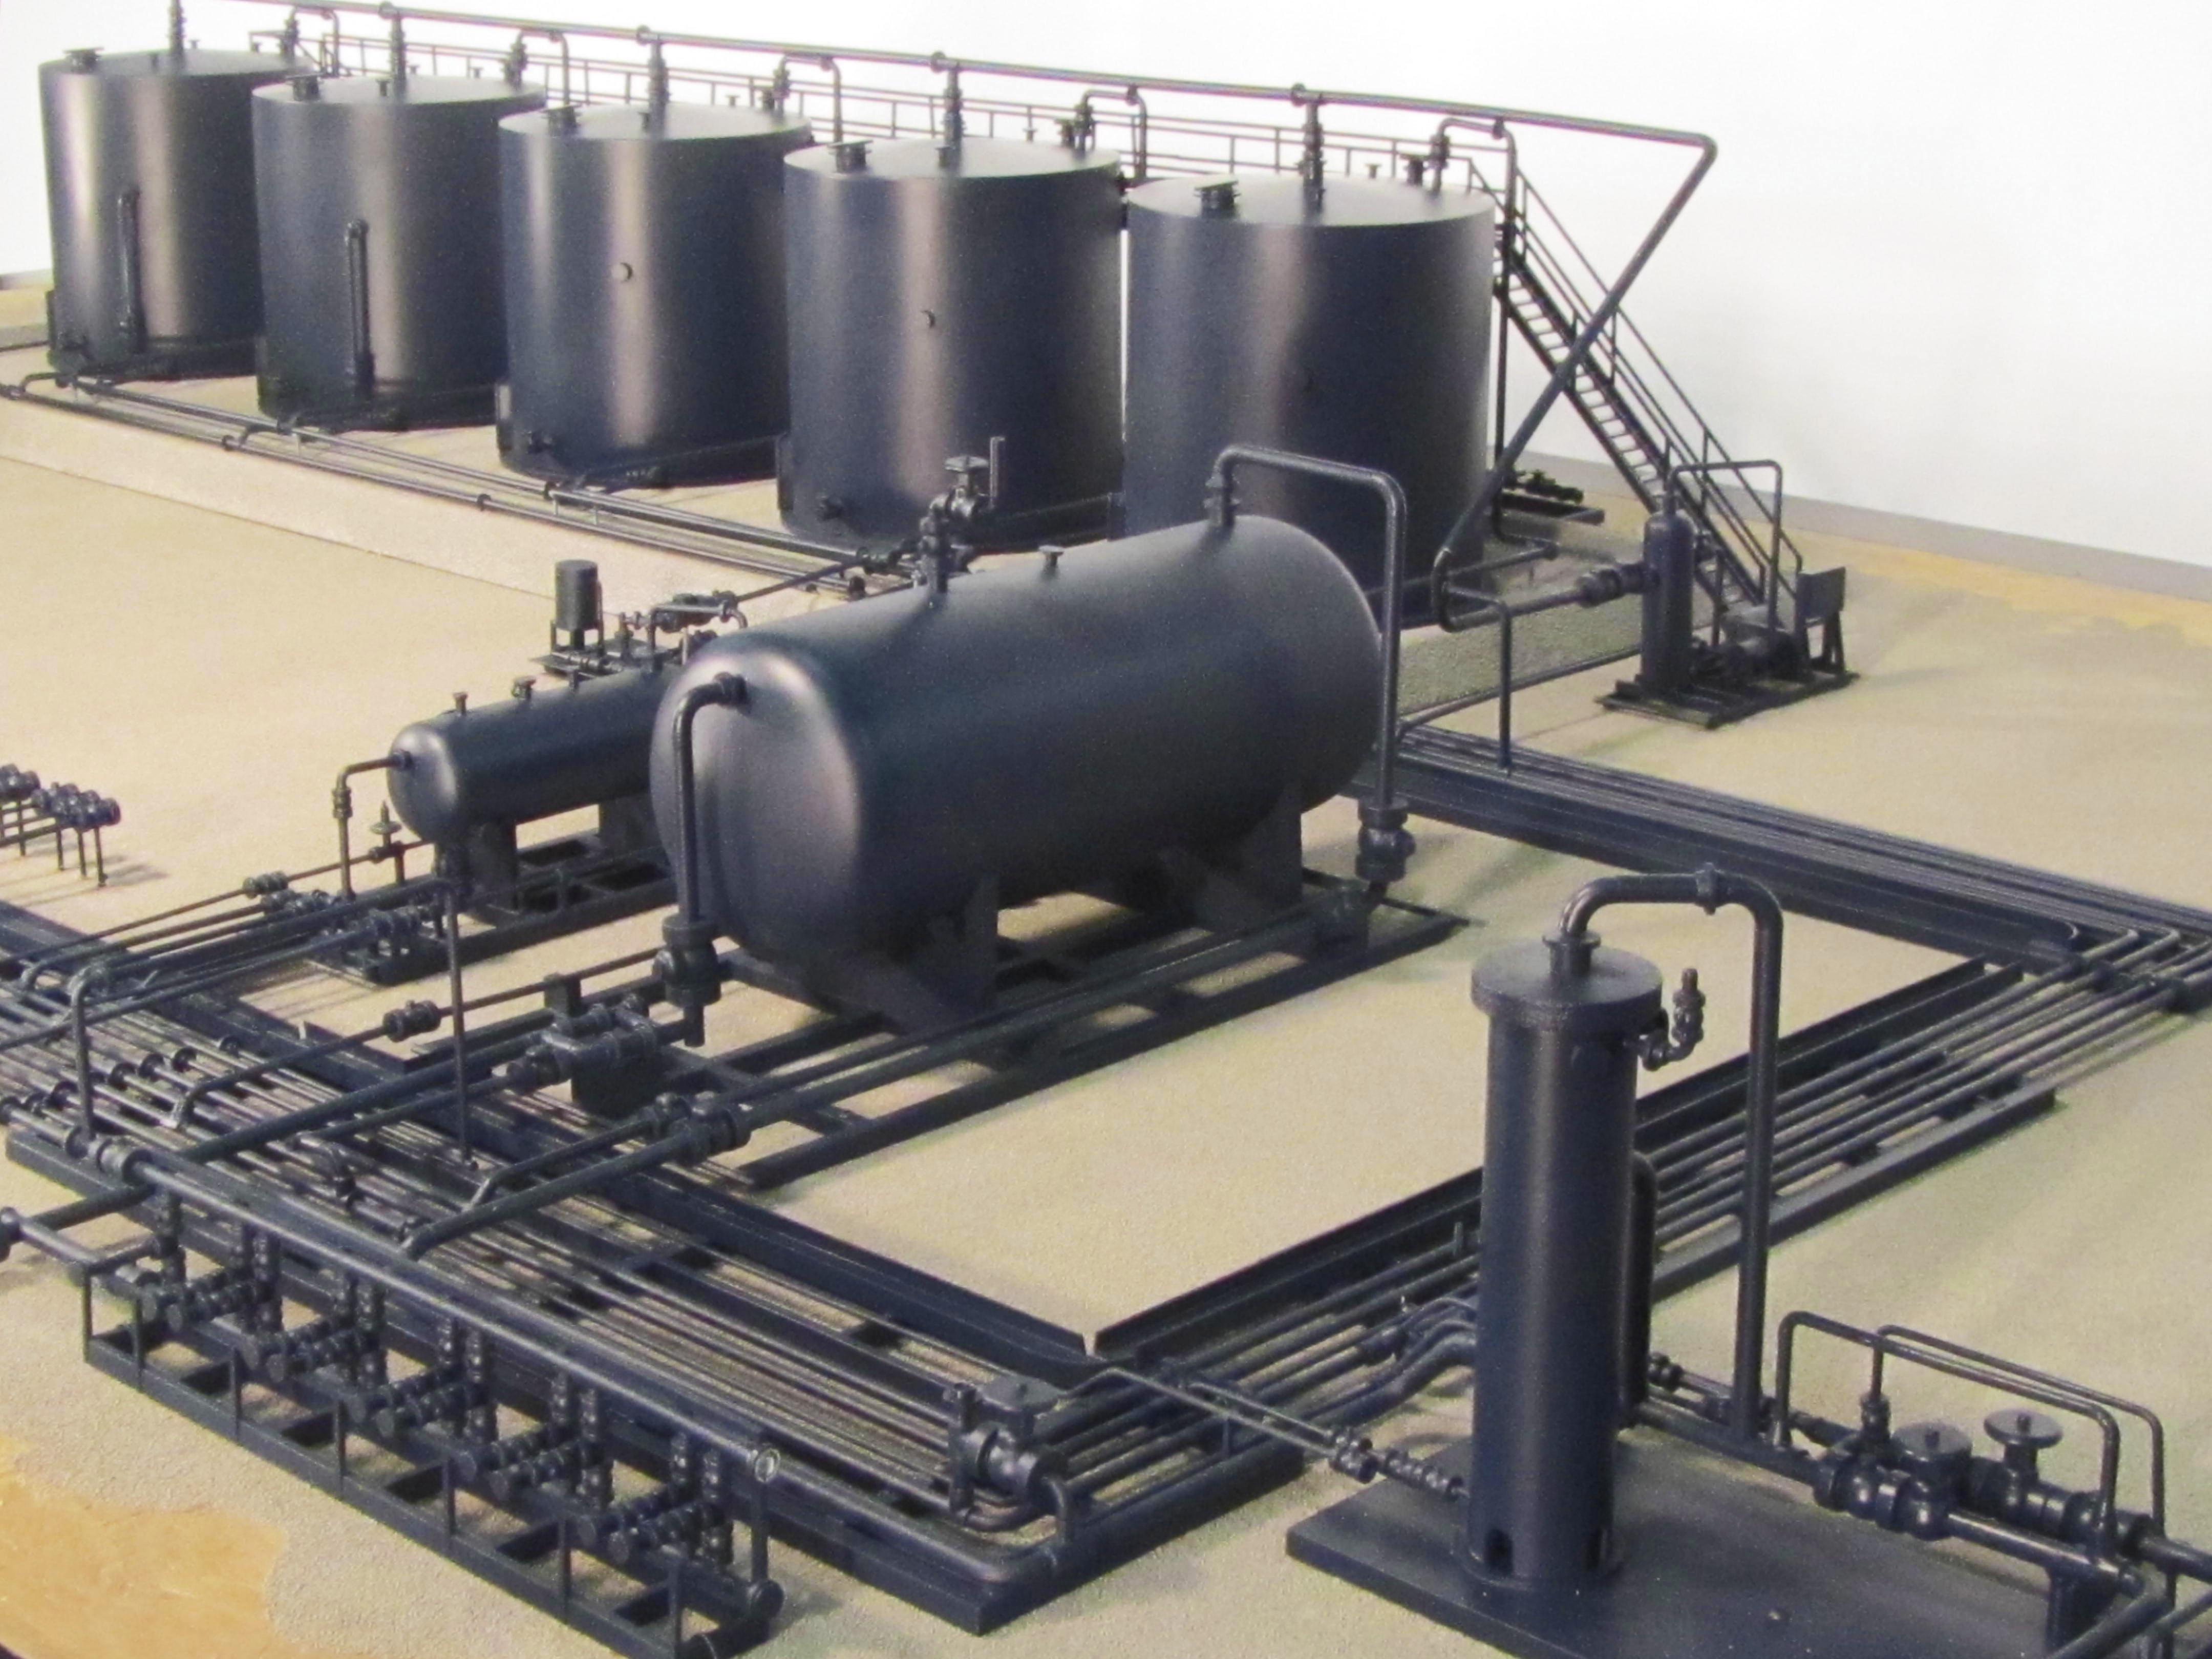 tank battery model shows modular design